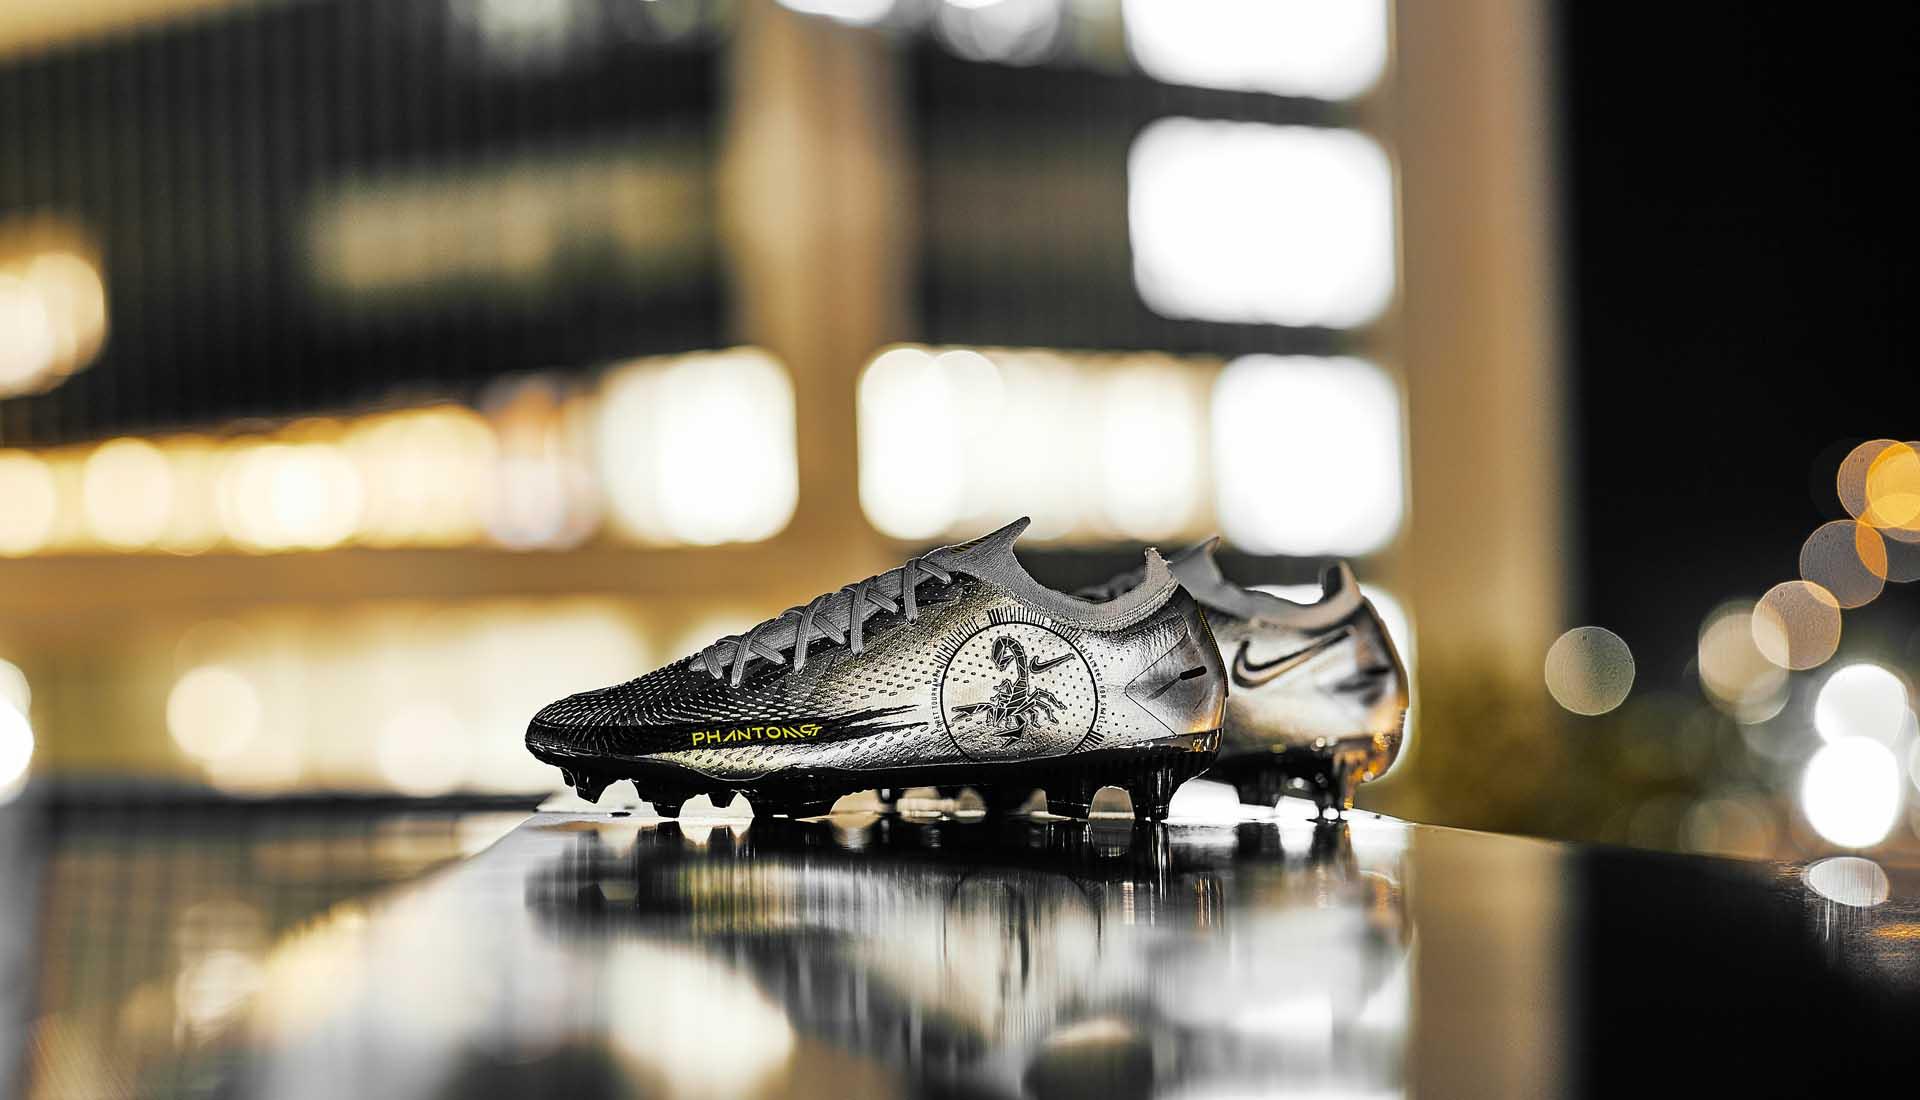 Chaussures de Foot Nike Phantom GT Scorpion